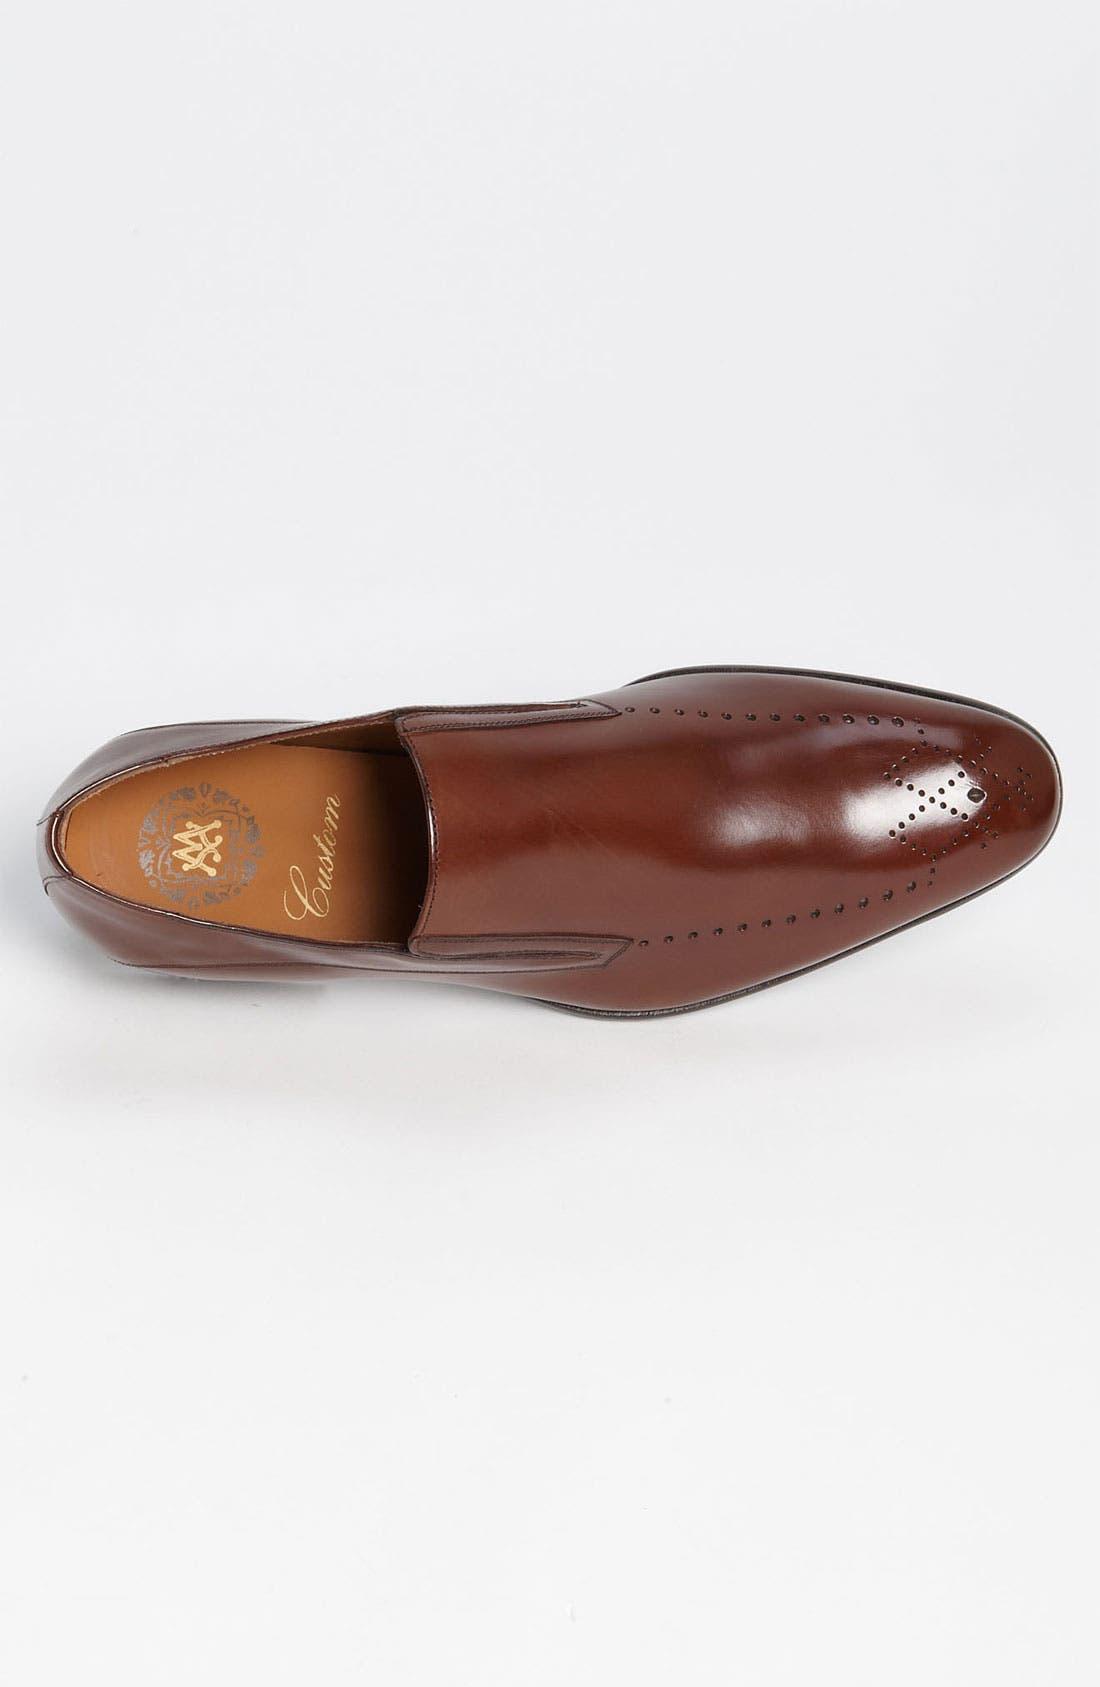 Alternate Image 3  - Mezlan 'Toscano' Venetian Loafer